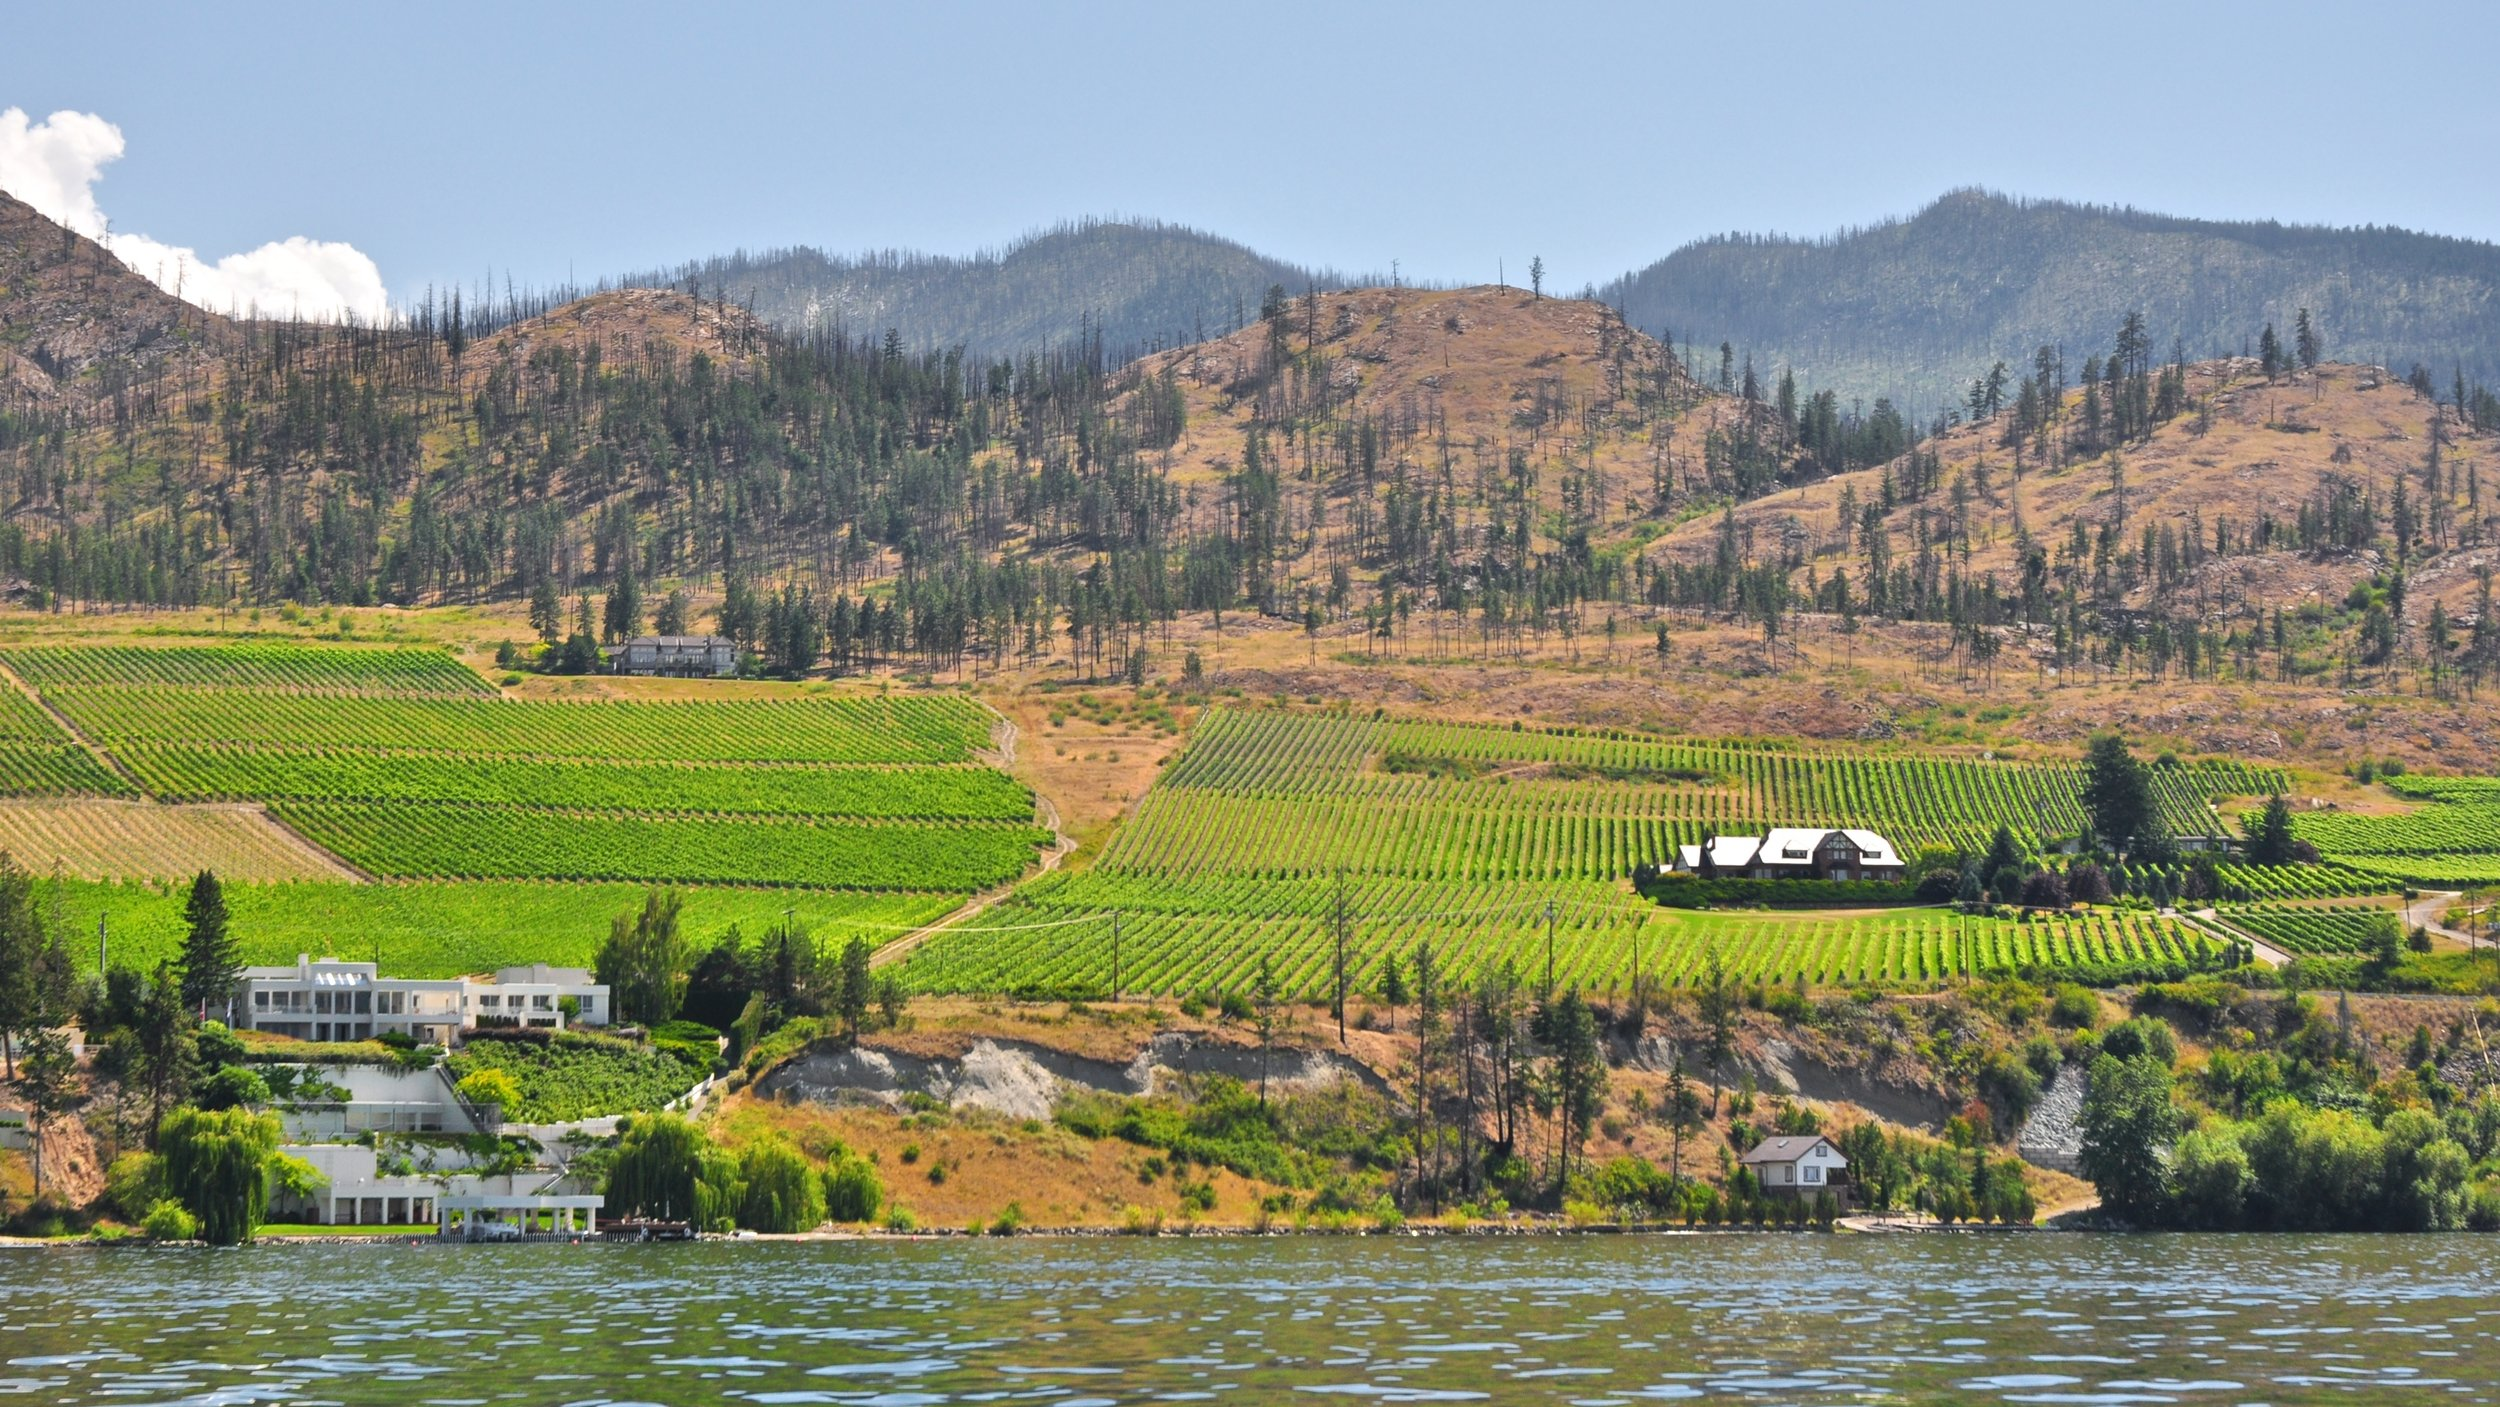 Kelowna_Vineyards_from_the_Okanagan_Lake.jpg